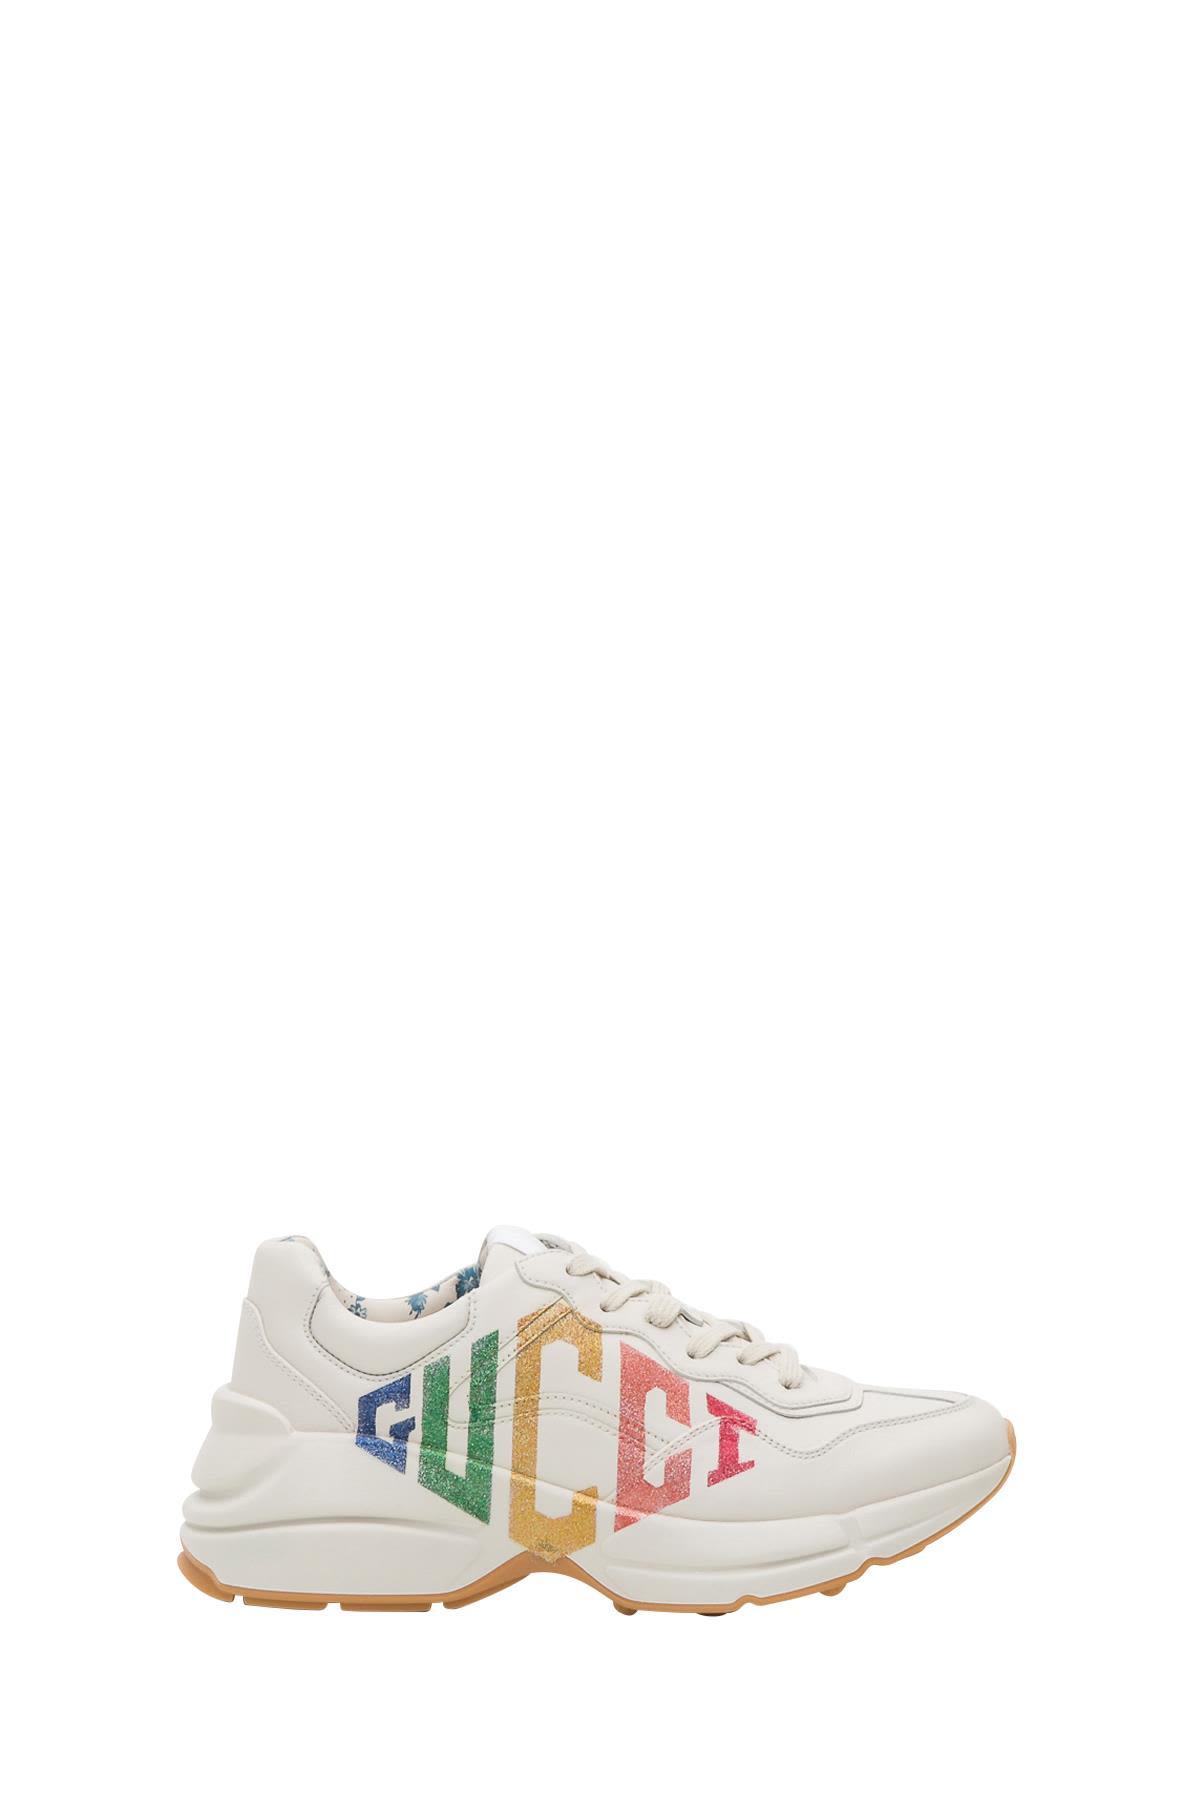 gucci -  Rhyton Glitter  Leather Sneaker